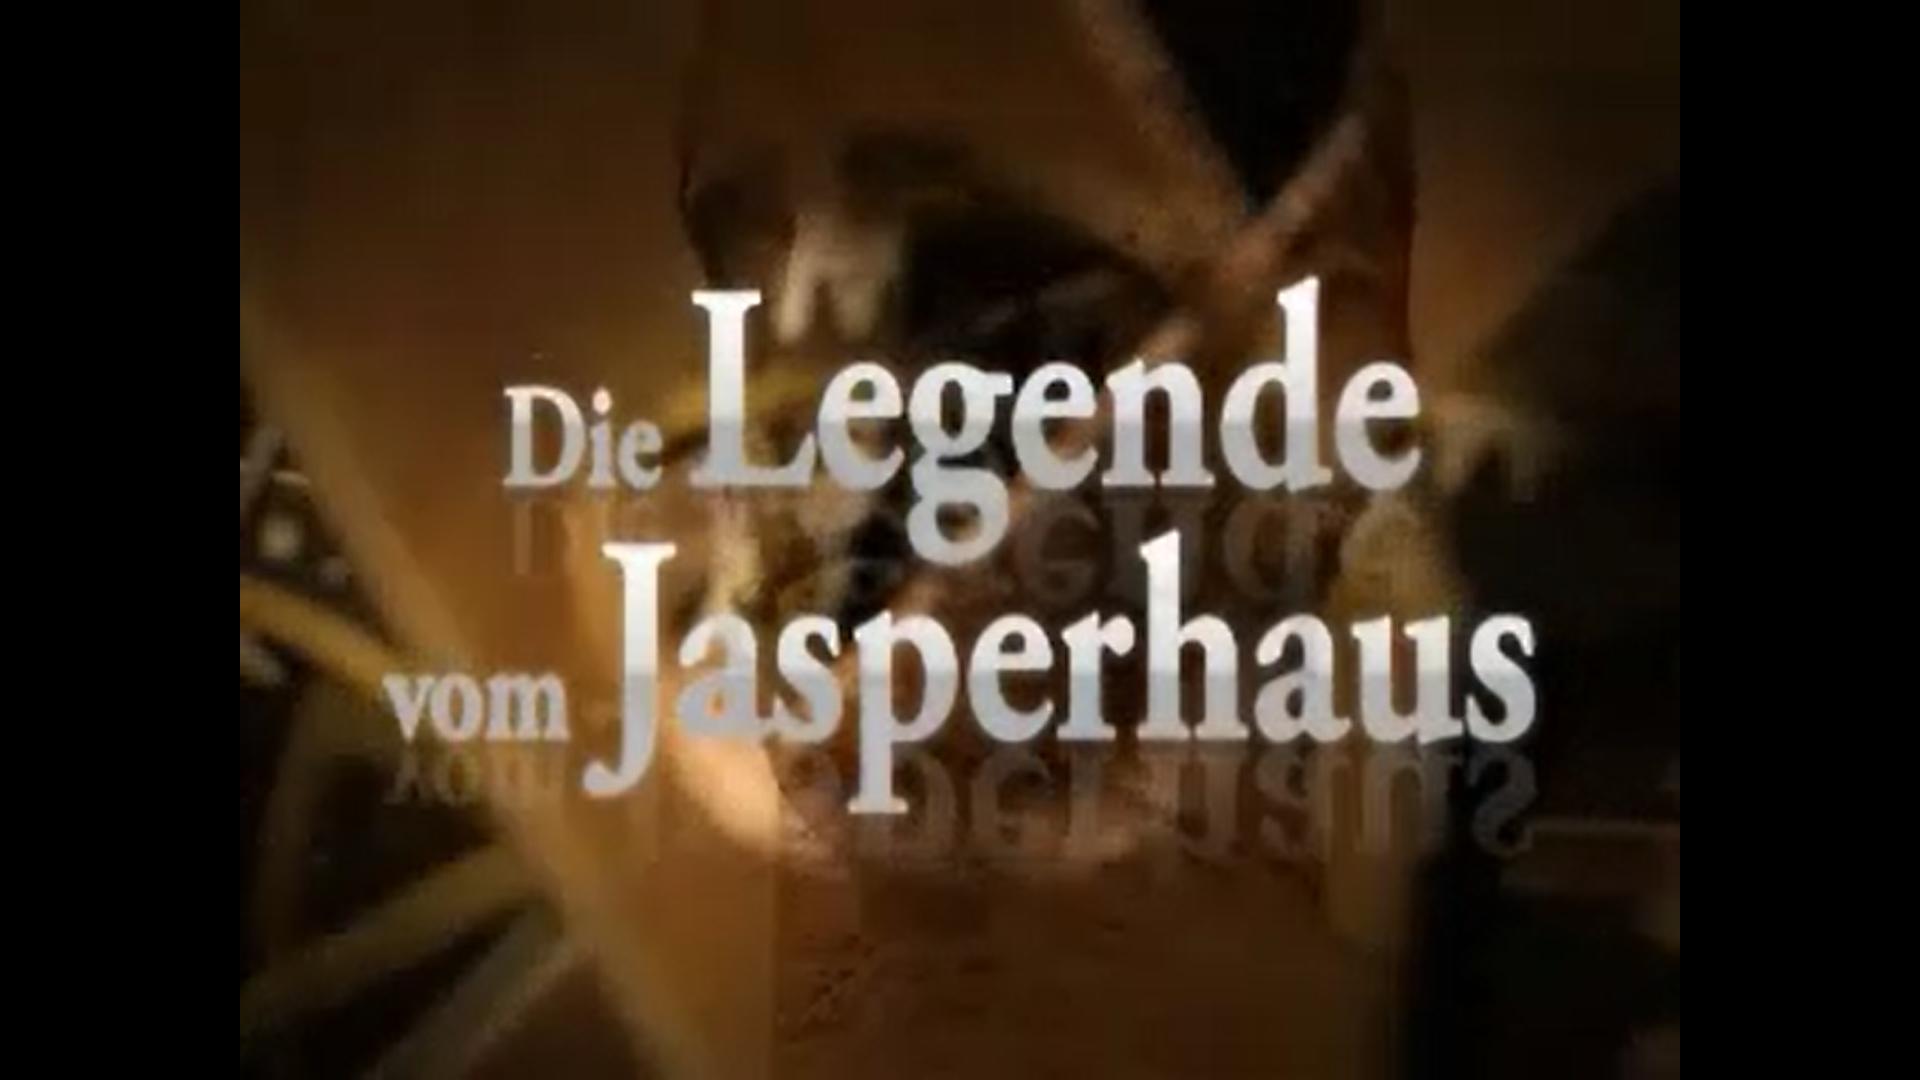 Die Legende vom Jasperhaus